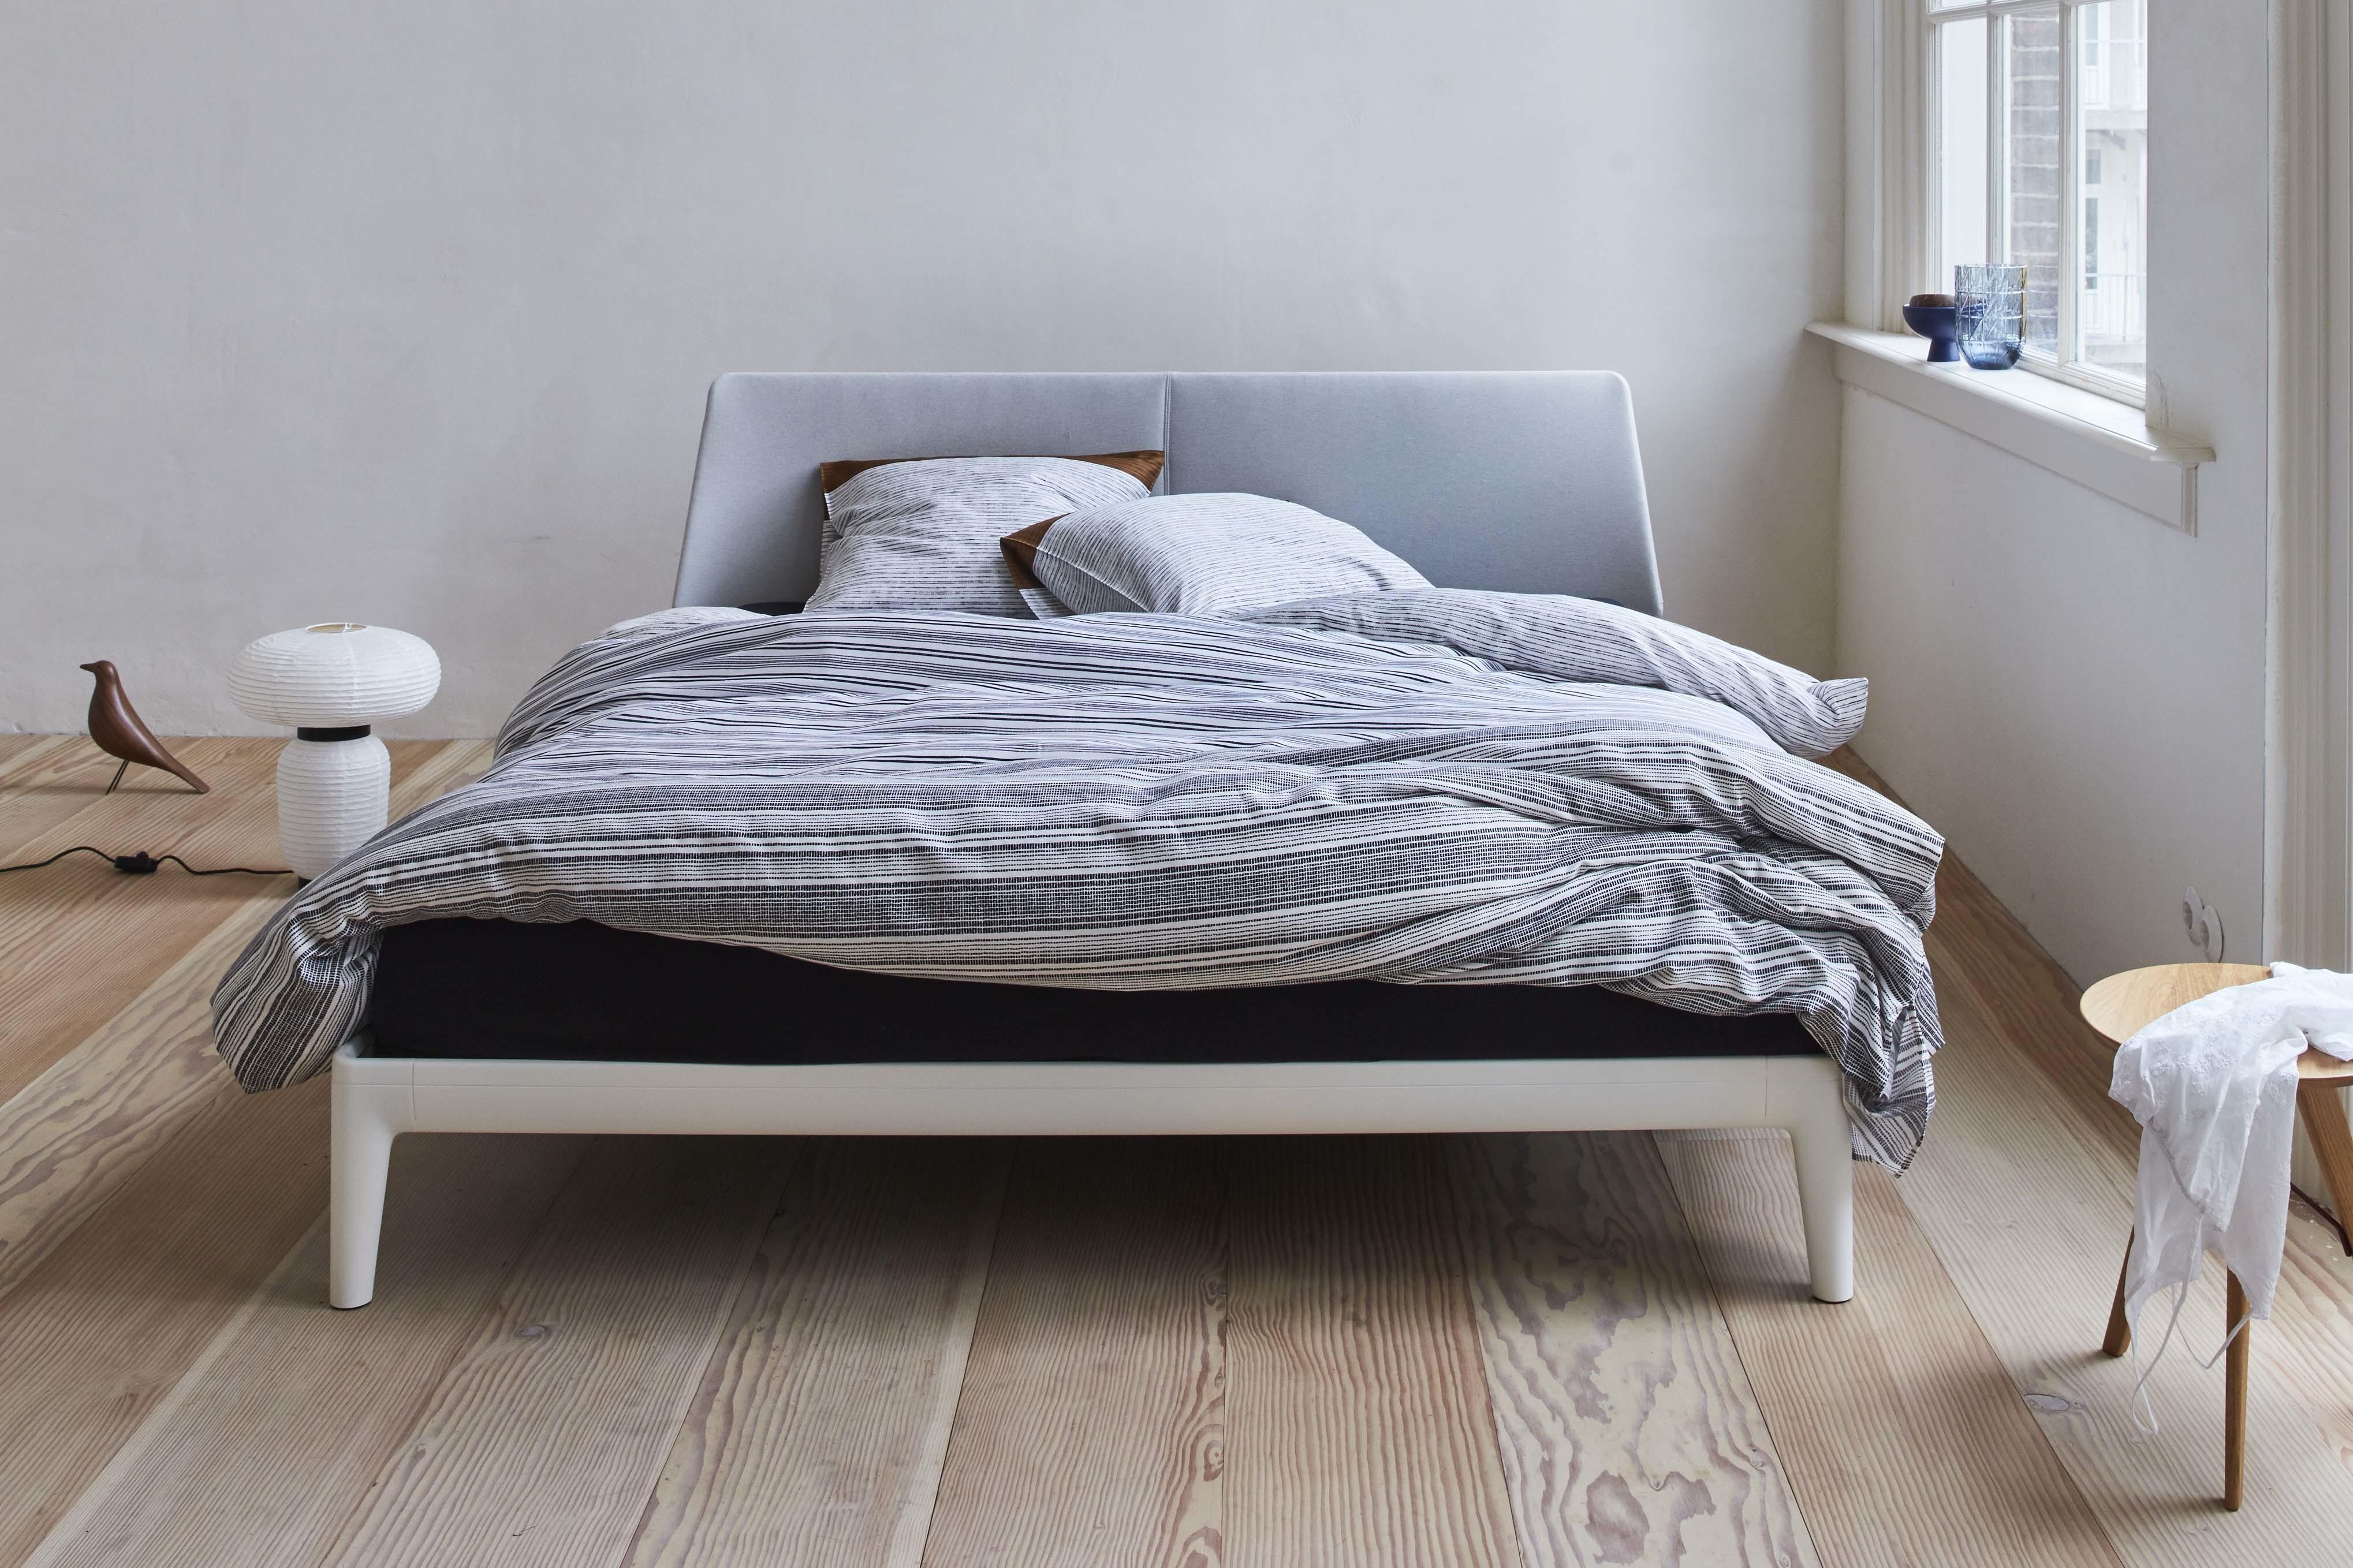 bed essential met bedframe